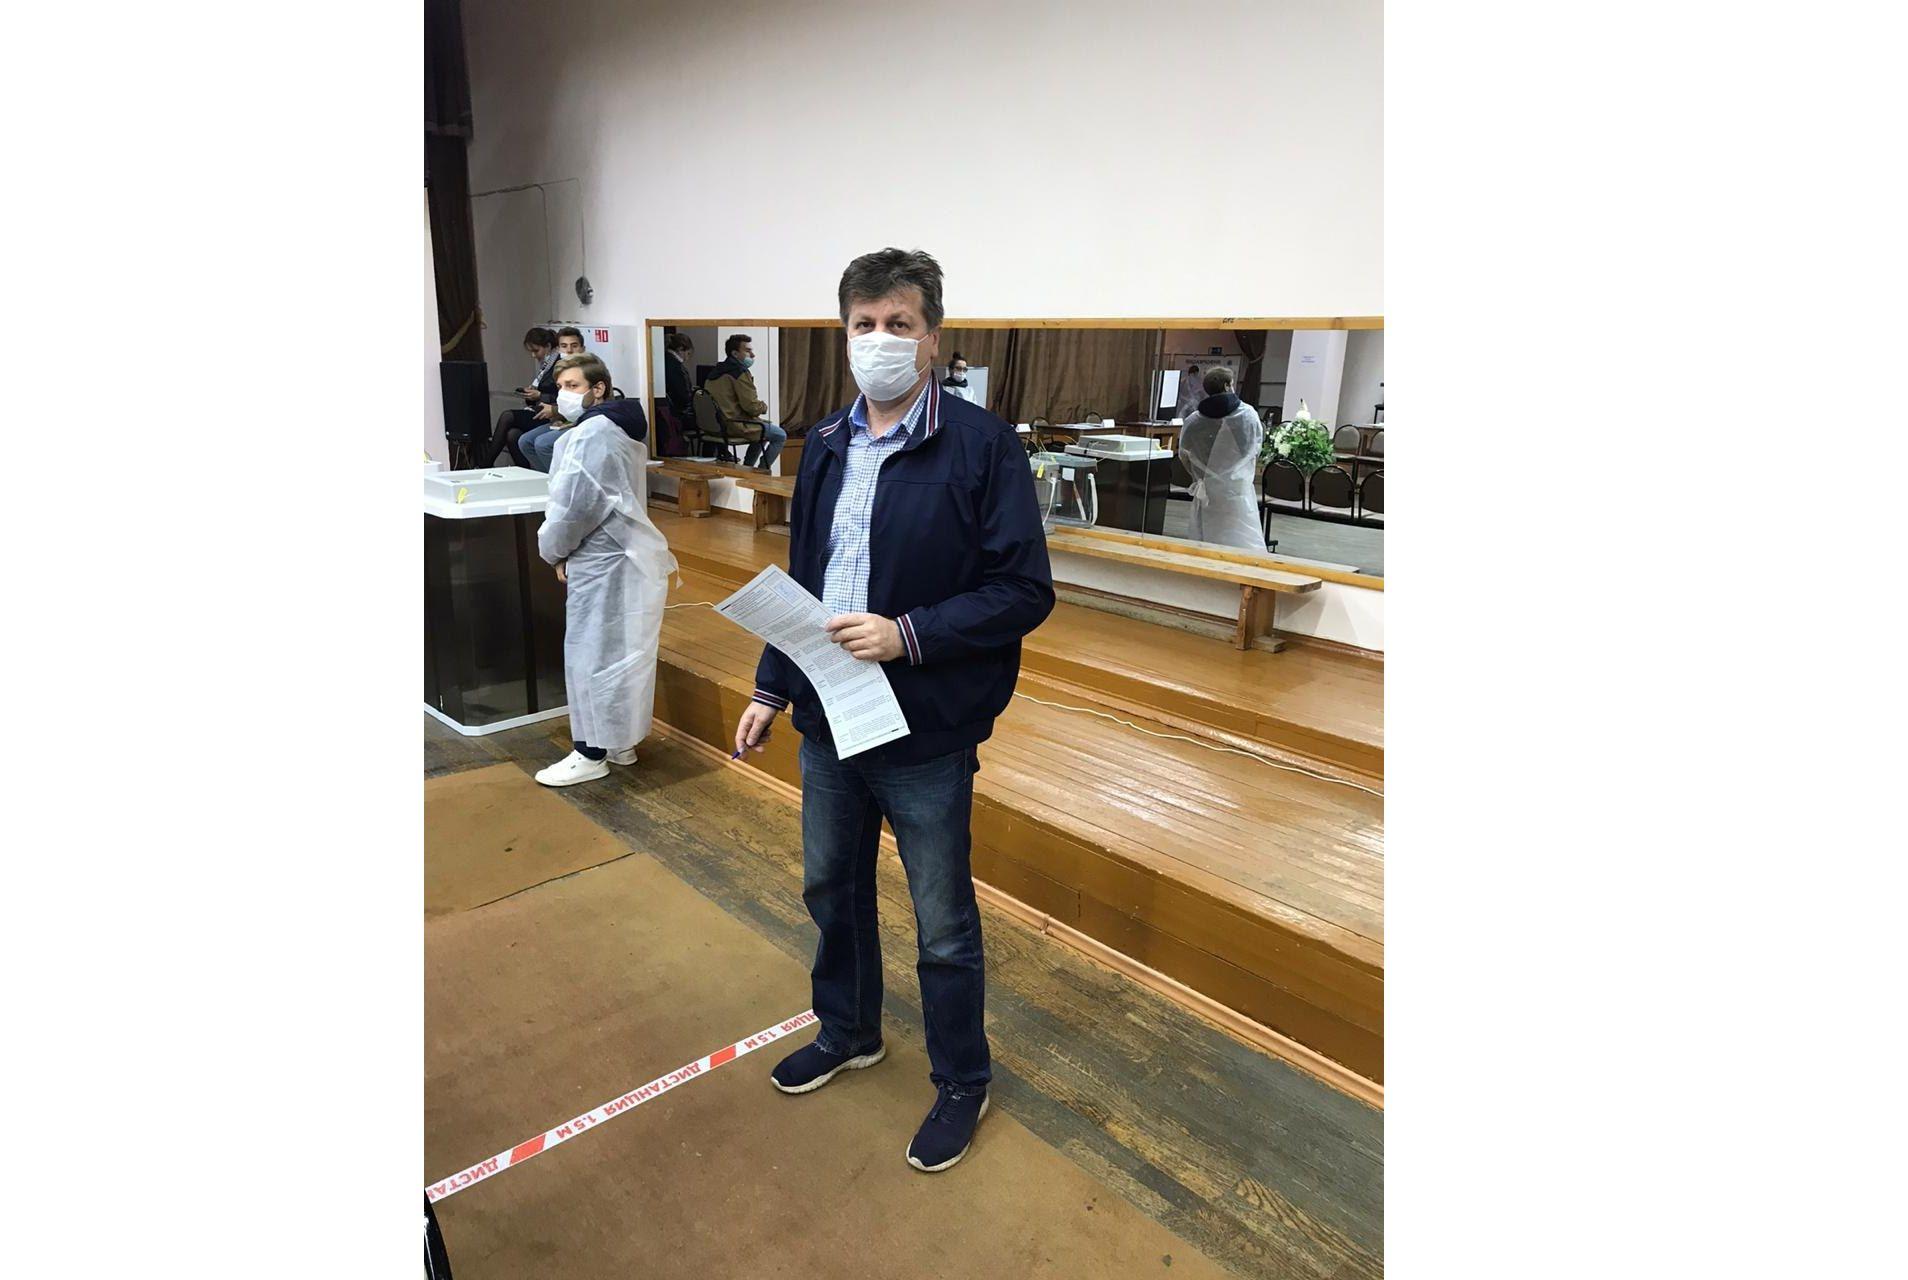 Социолог Евгений Голубев: явка 84% на онлайн-голосовании - это хороший результат